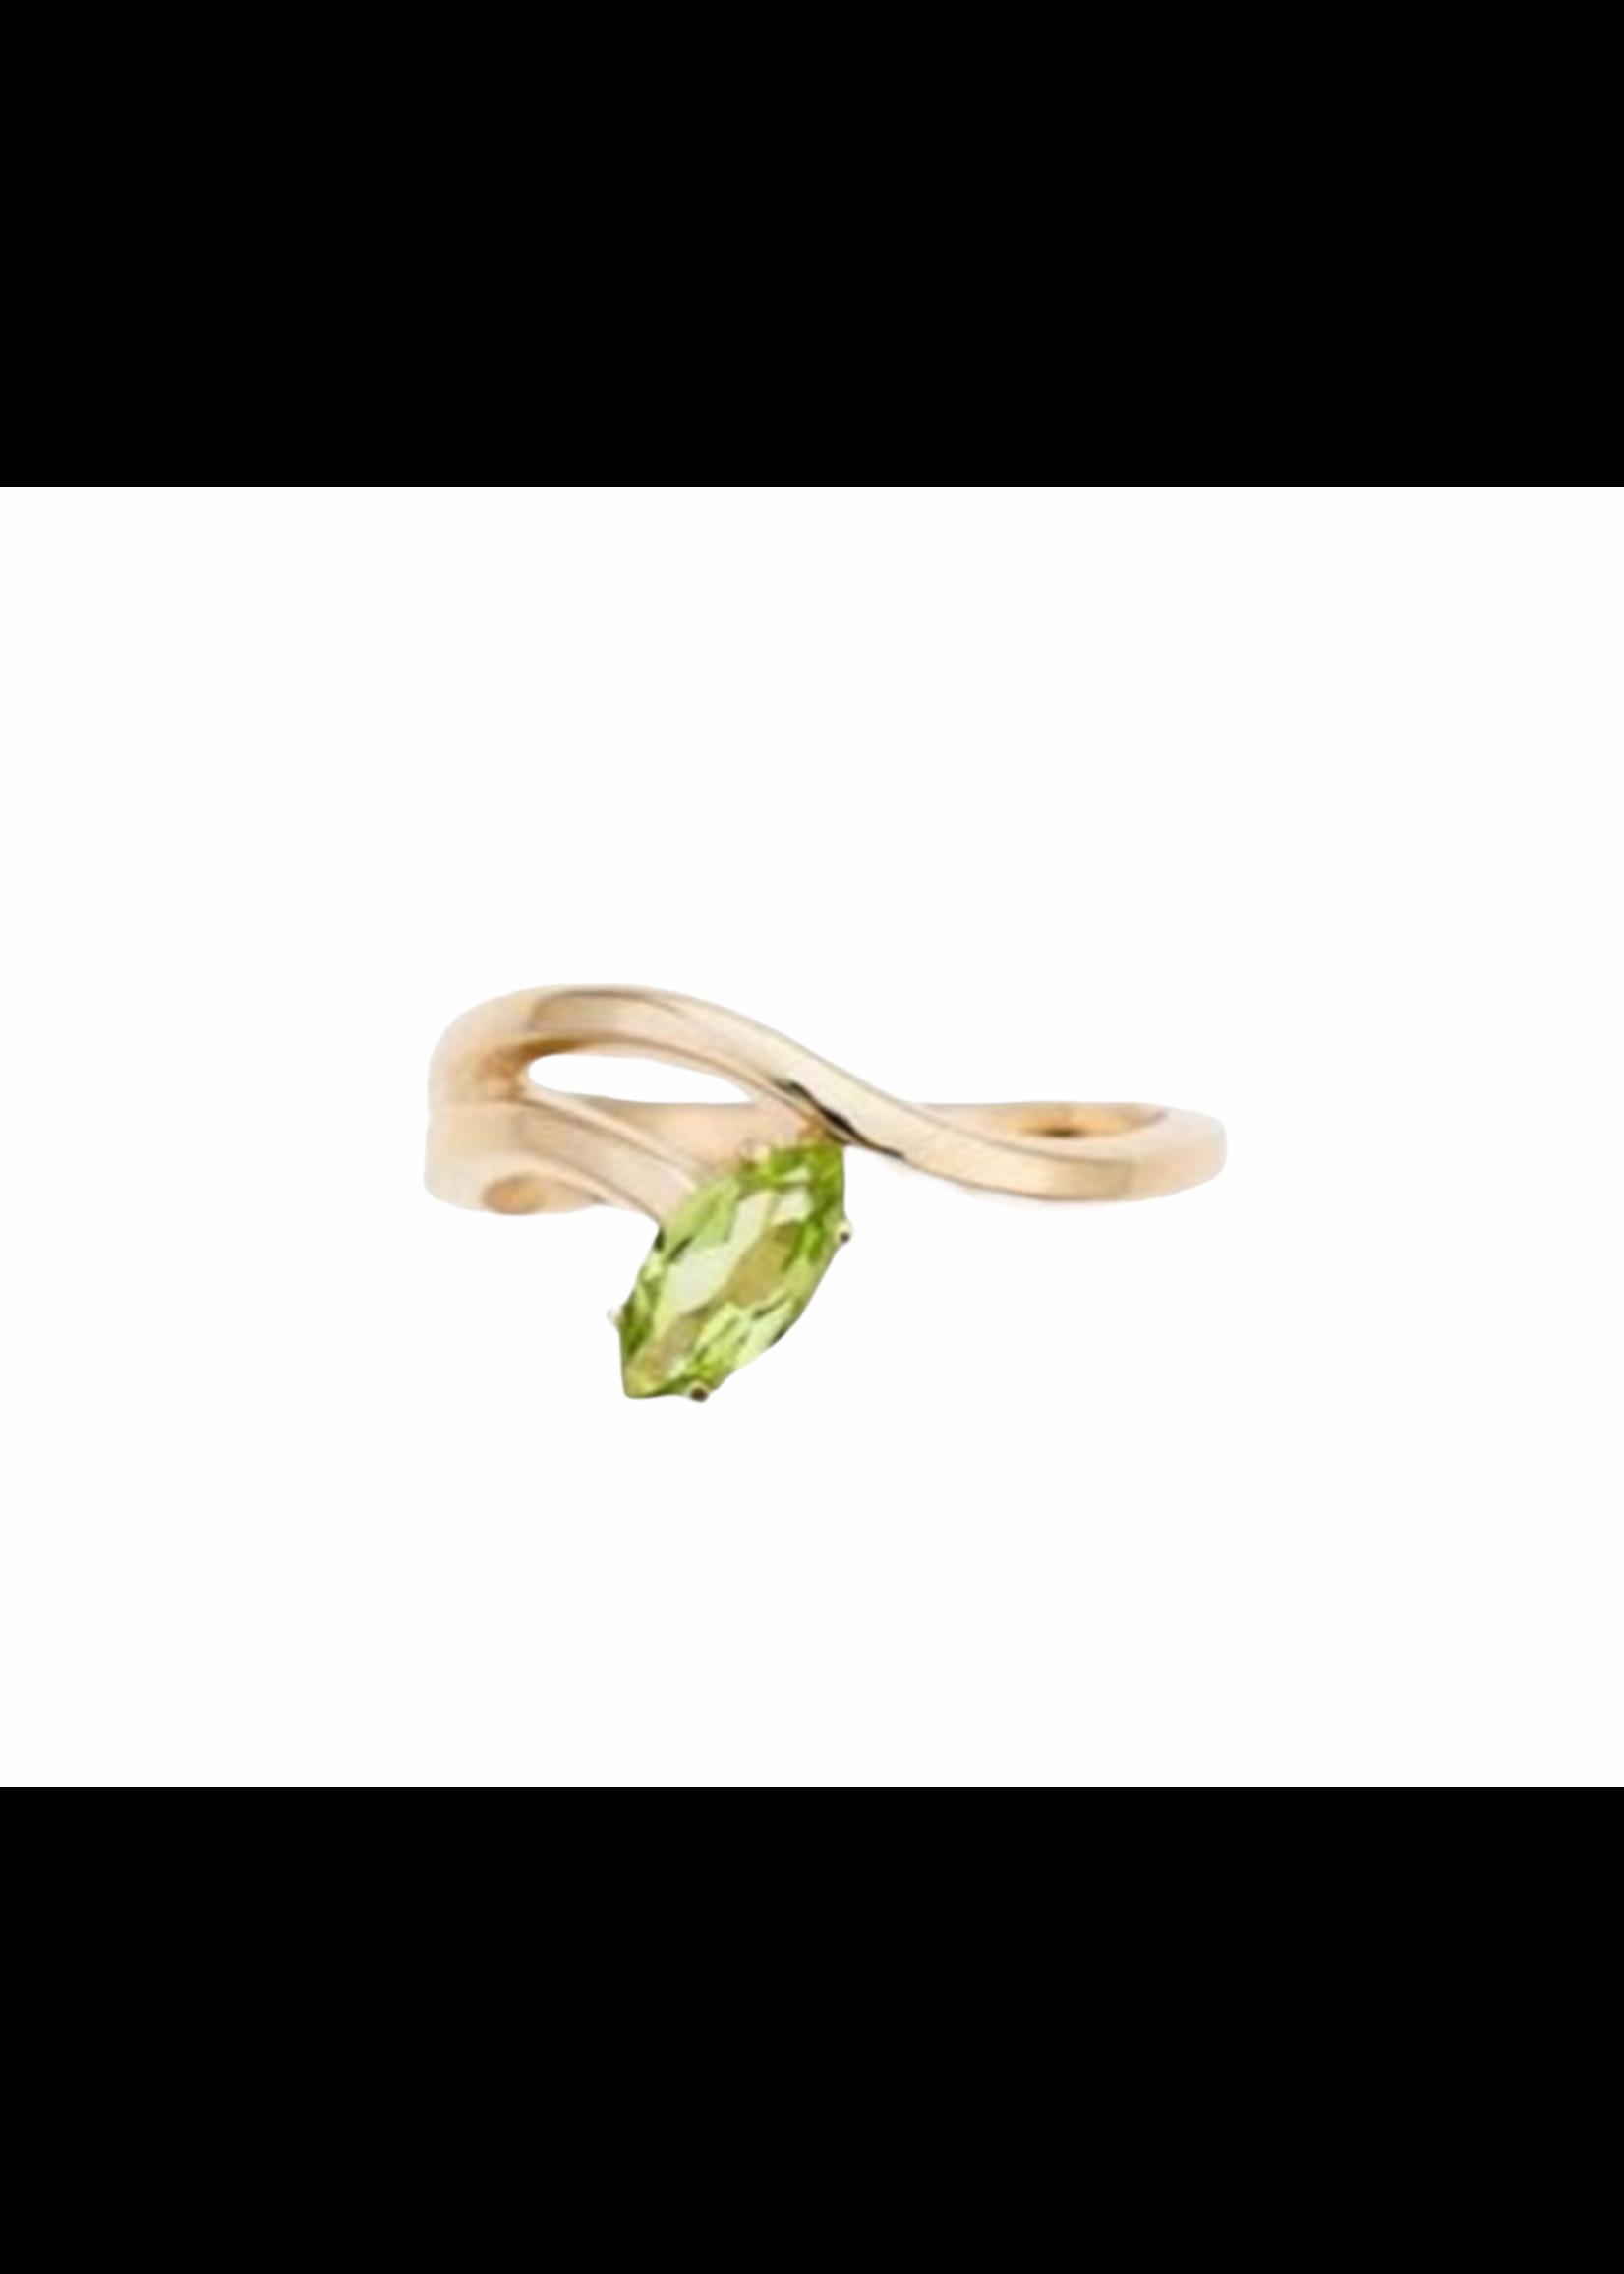 Bea Bongiasca Morning Star Lily Gold Ring